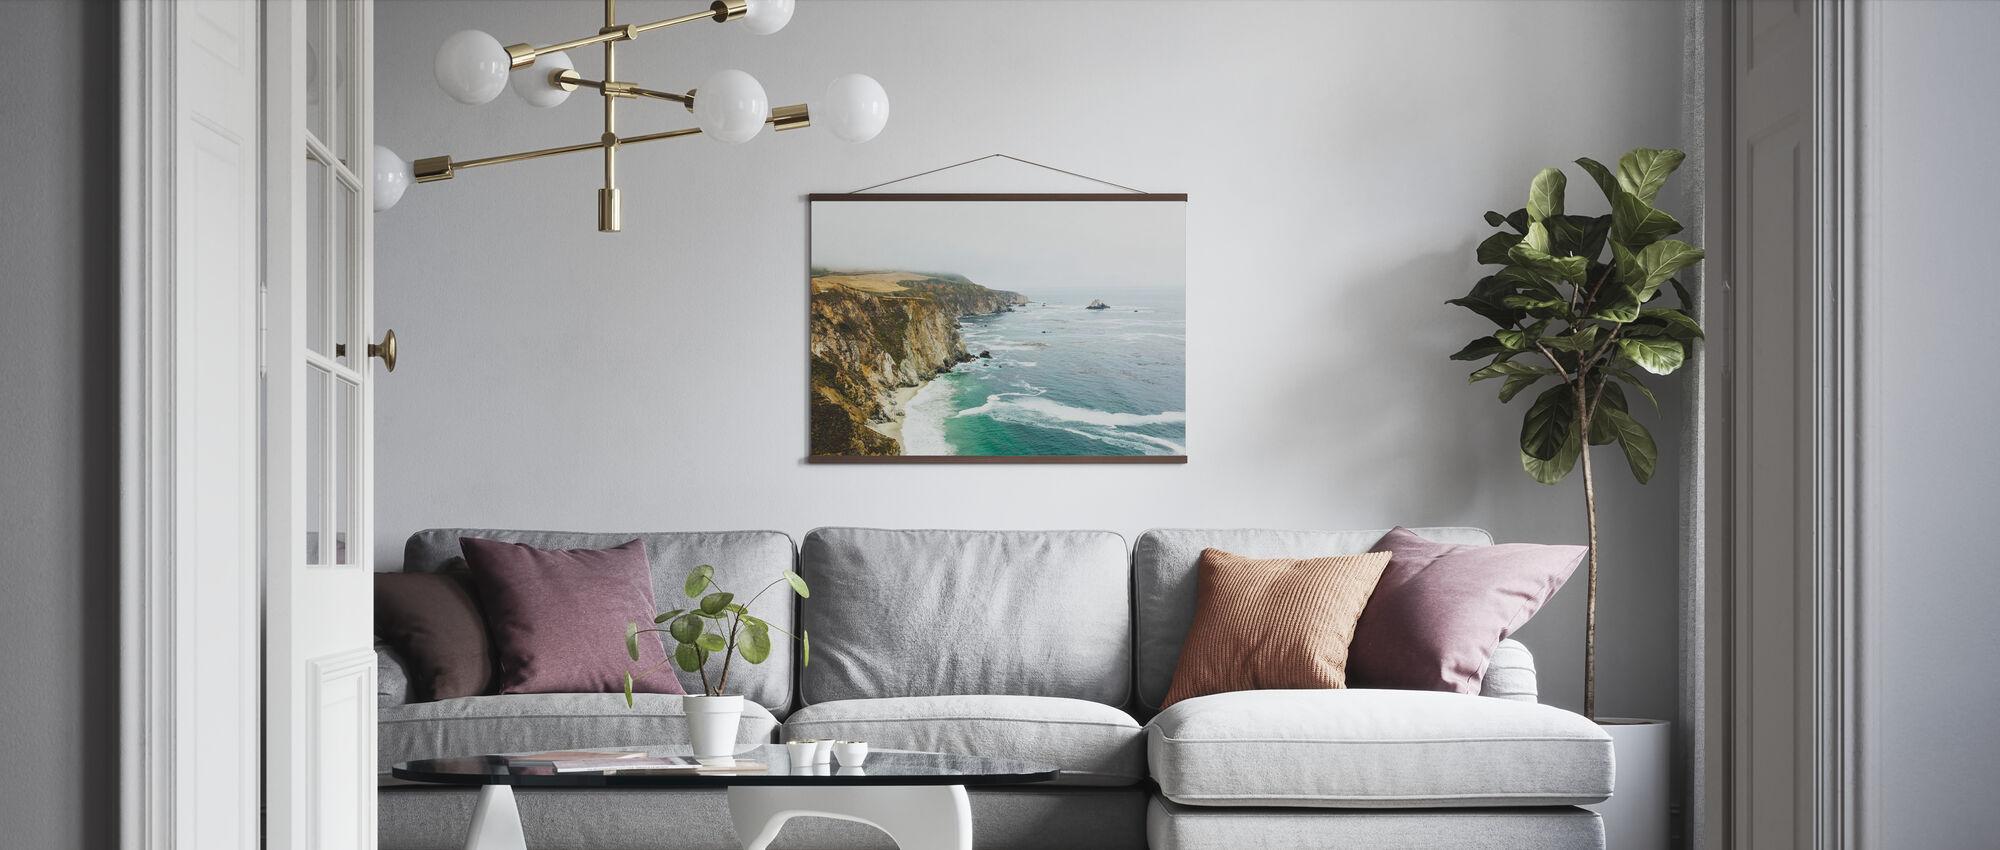 Big Sur, California - Poster - Living Room